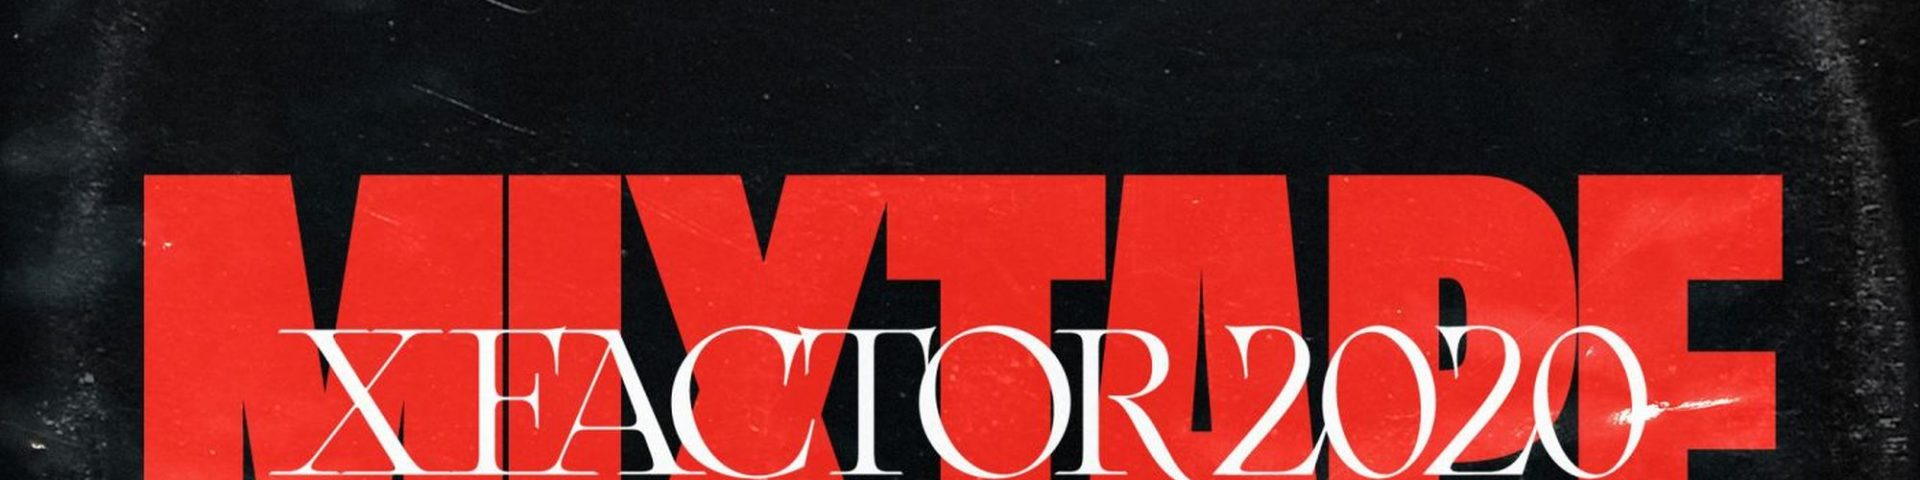 X Factor Mixtape 2020: fuori venerdì 30 ottobre i brani originali